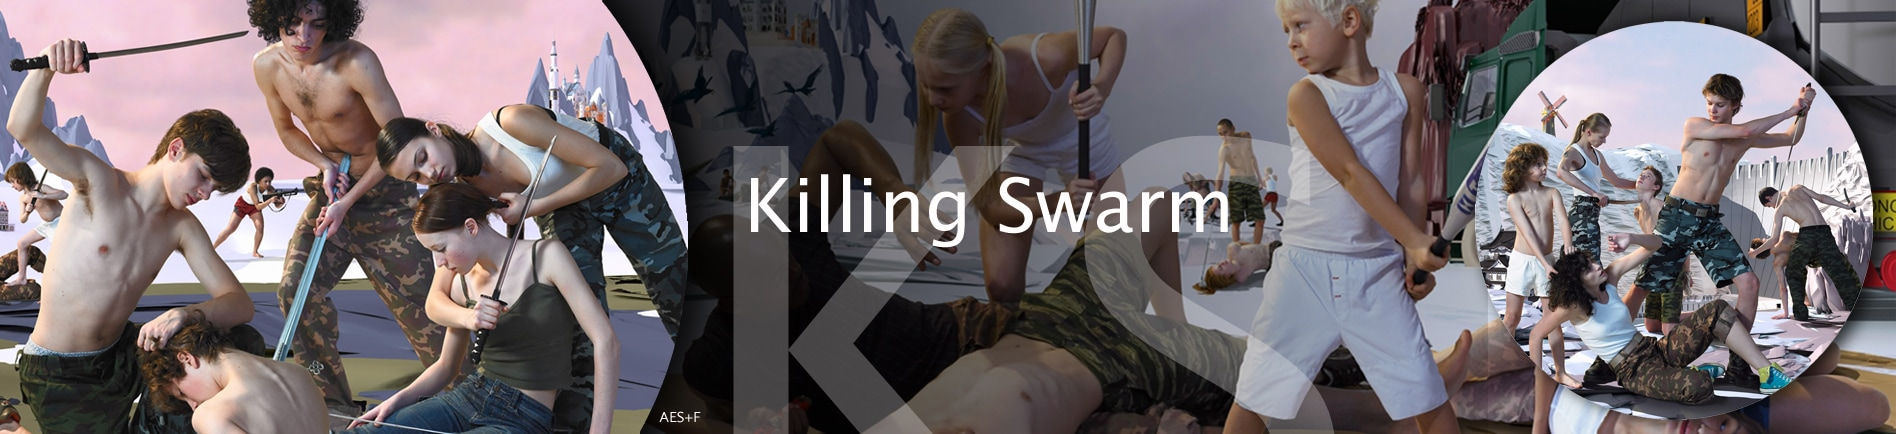 KillingSwarm